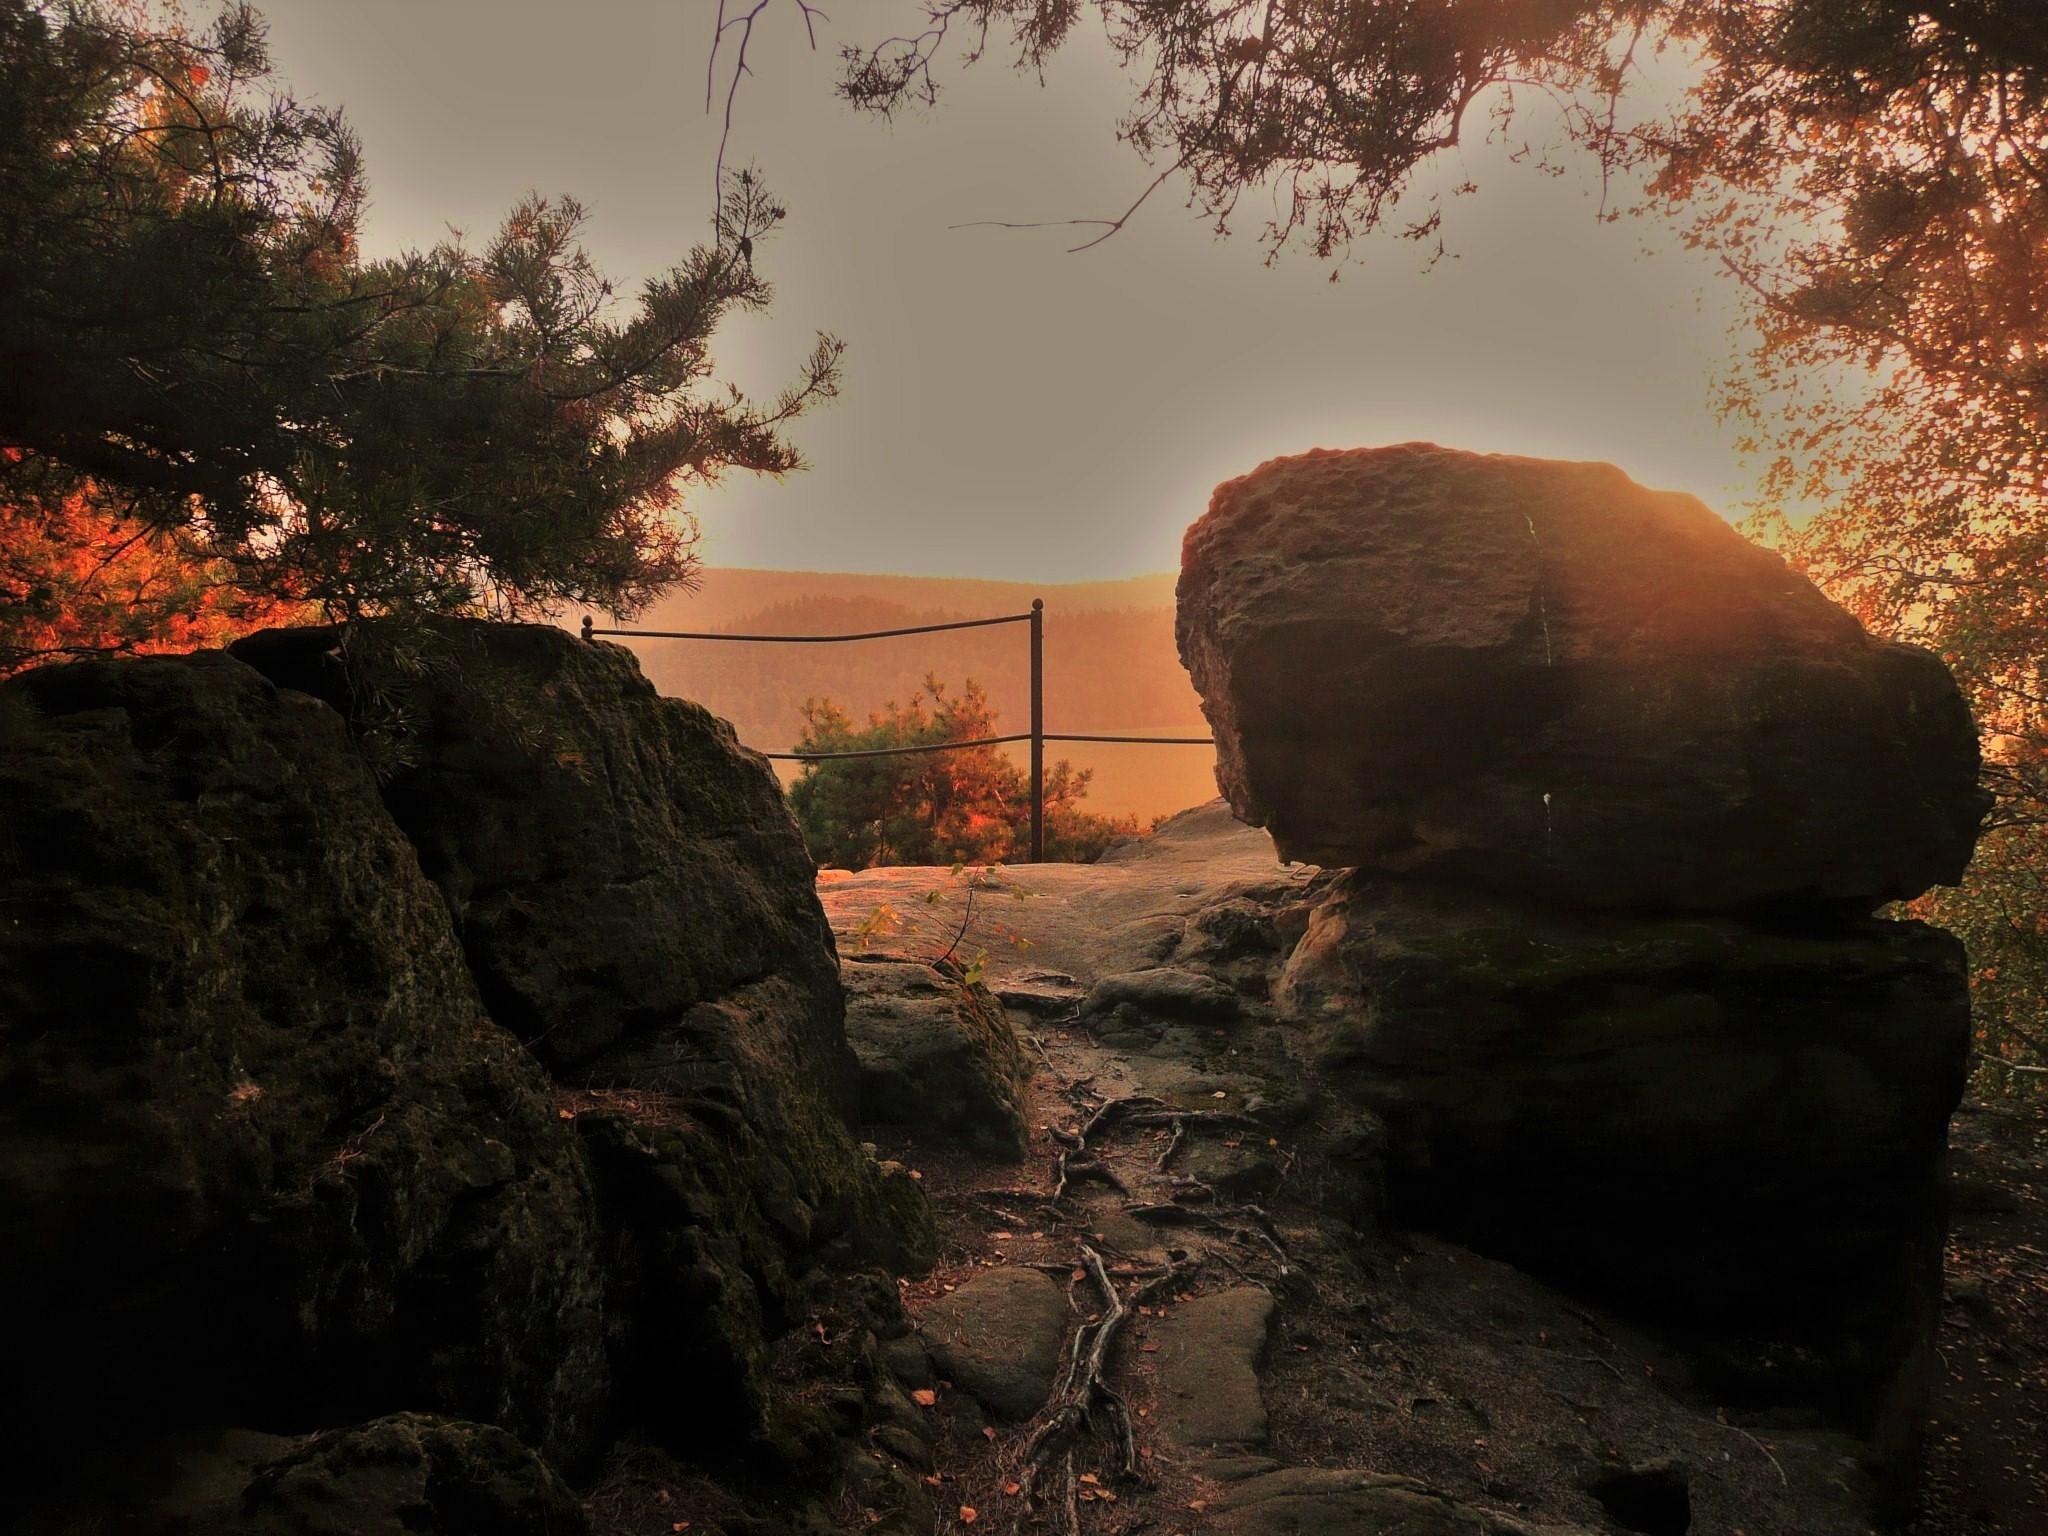 Sonnenuntergang an der Fuchsklippe (Foto Zeitzmann)